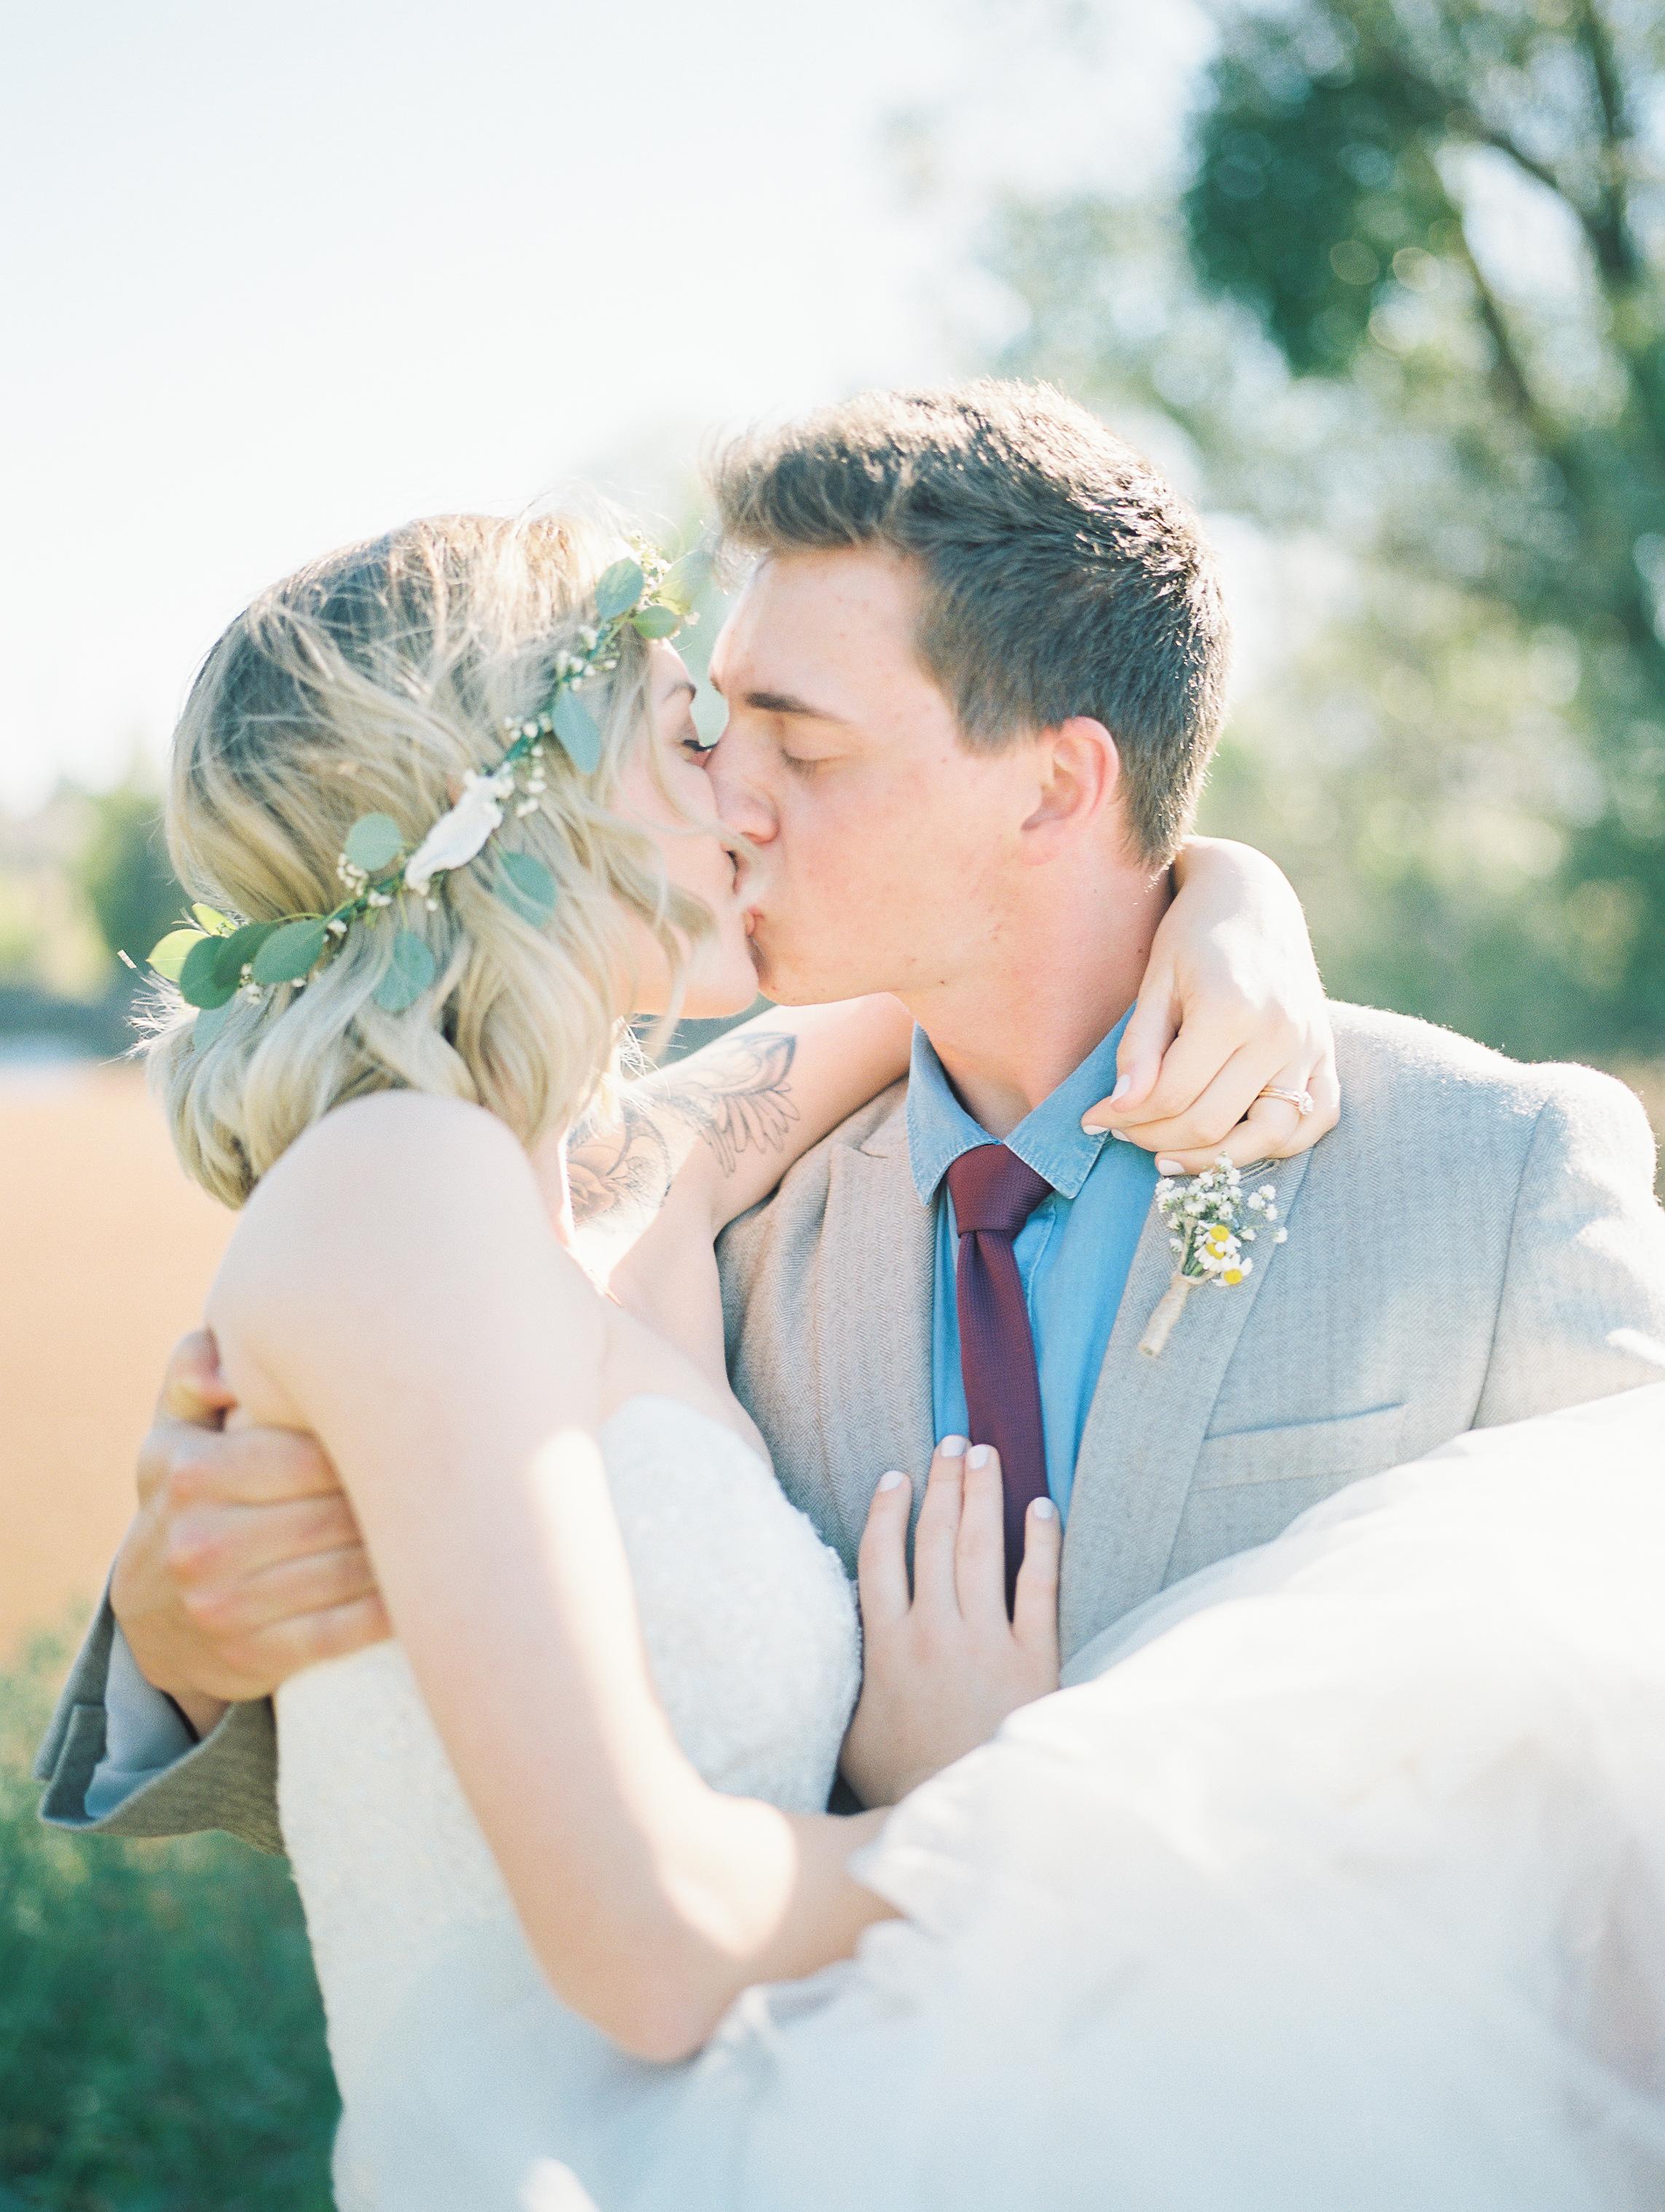 clayton+kennedy-married-filmscans-17.jpg